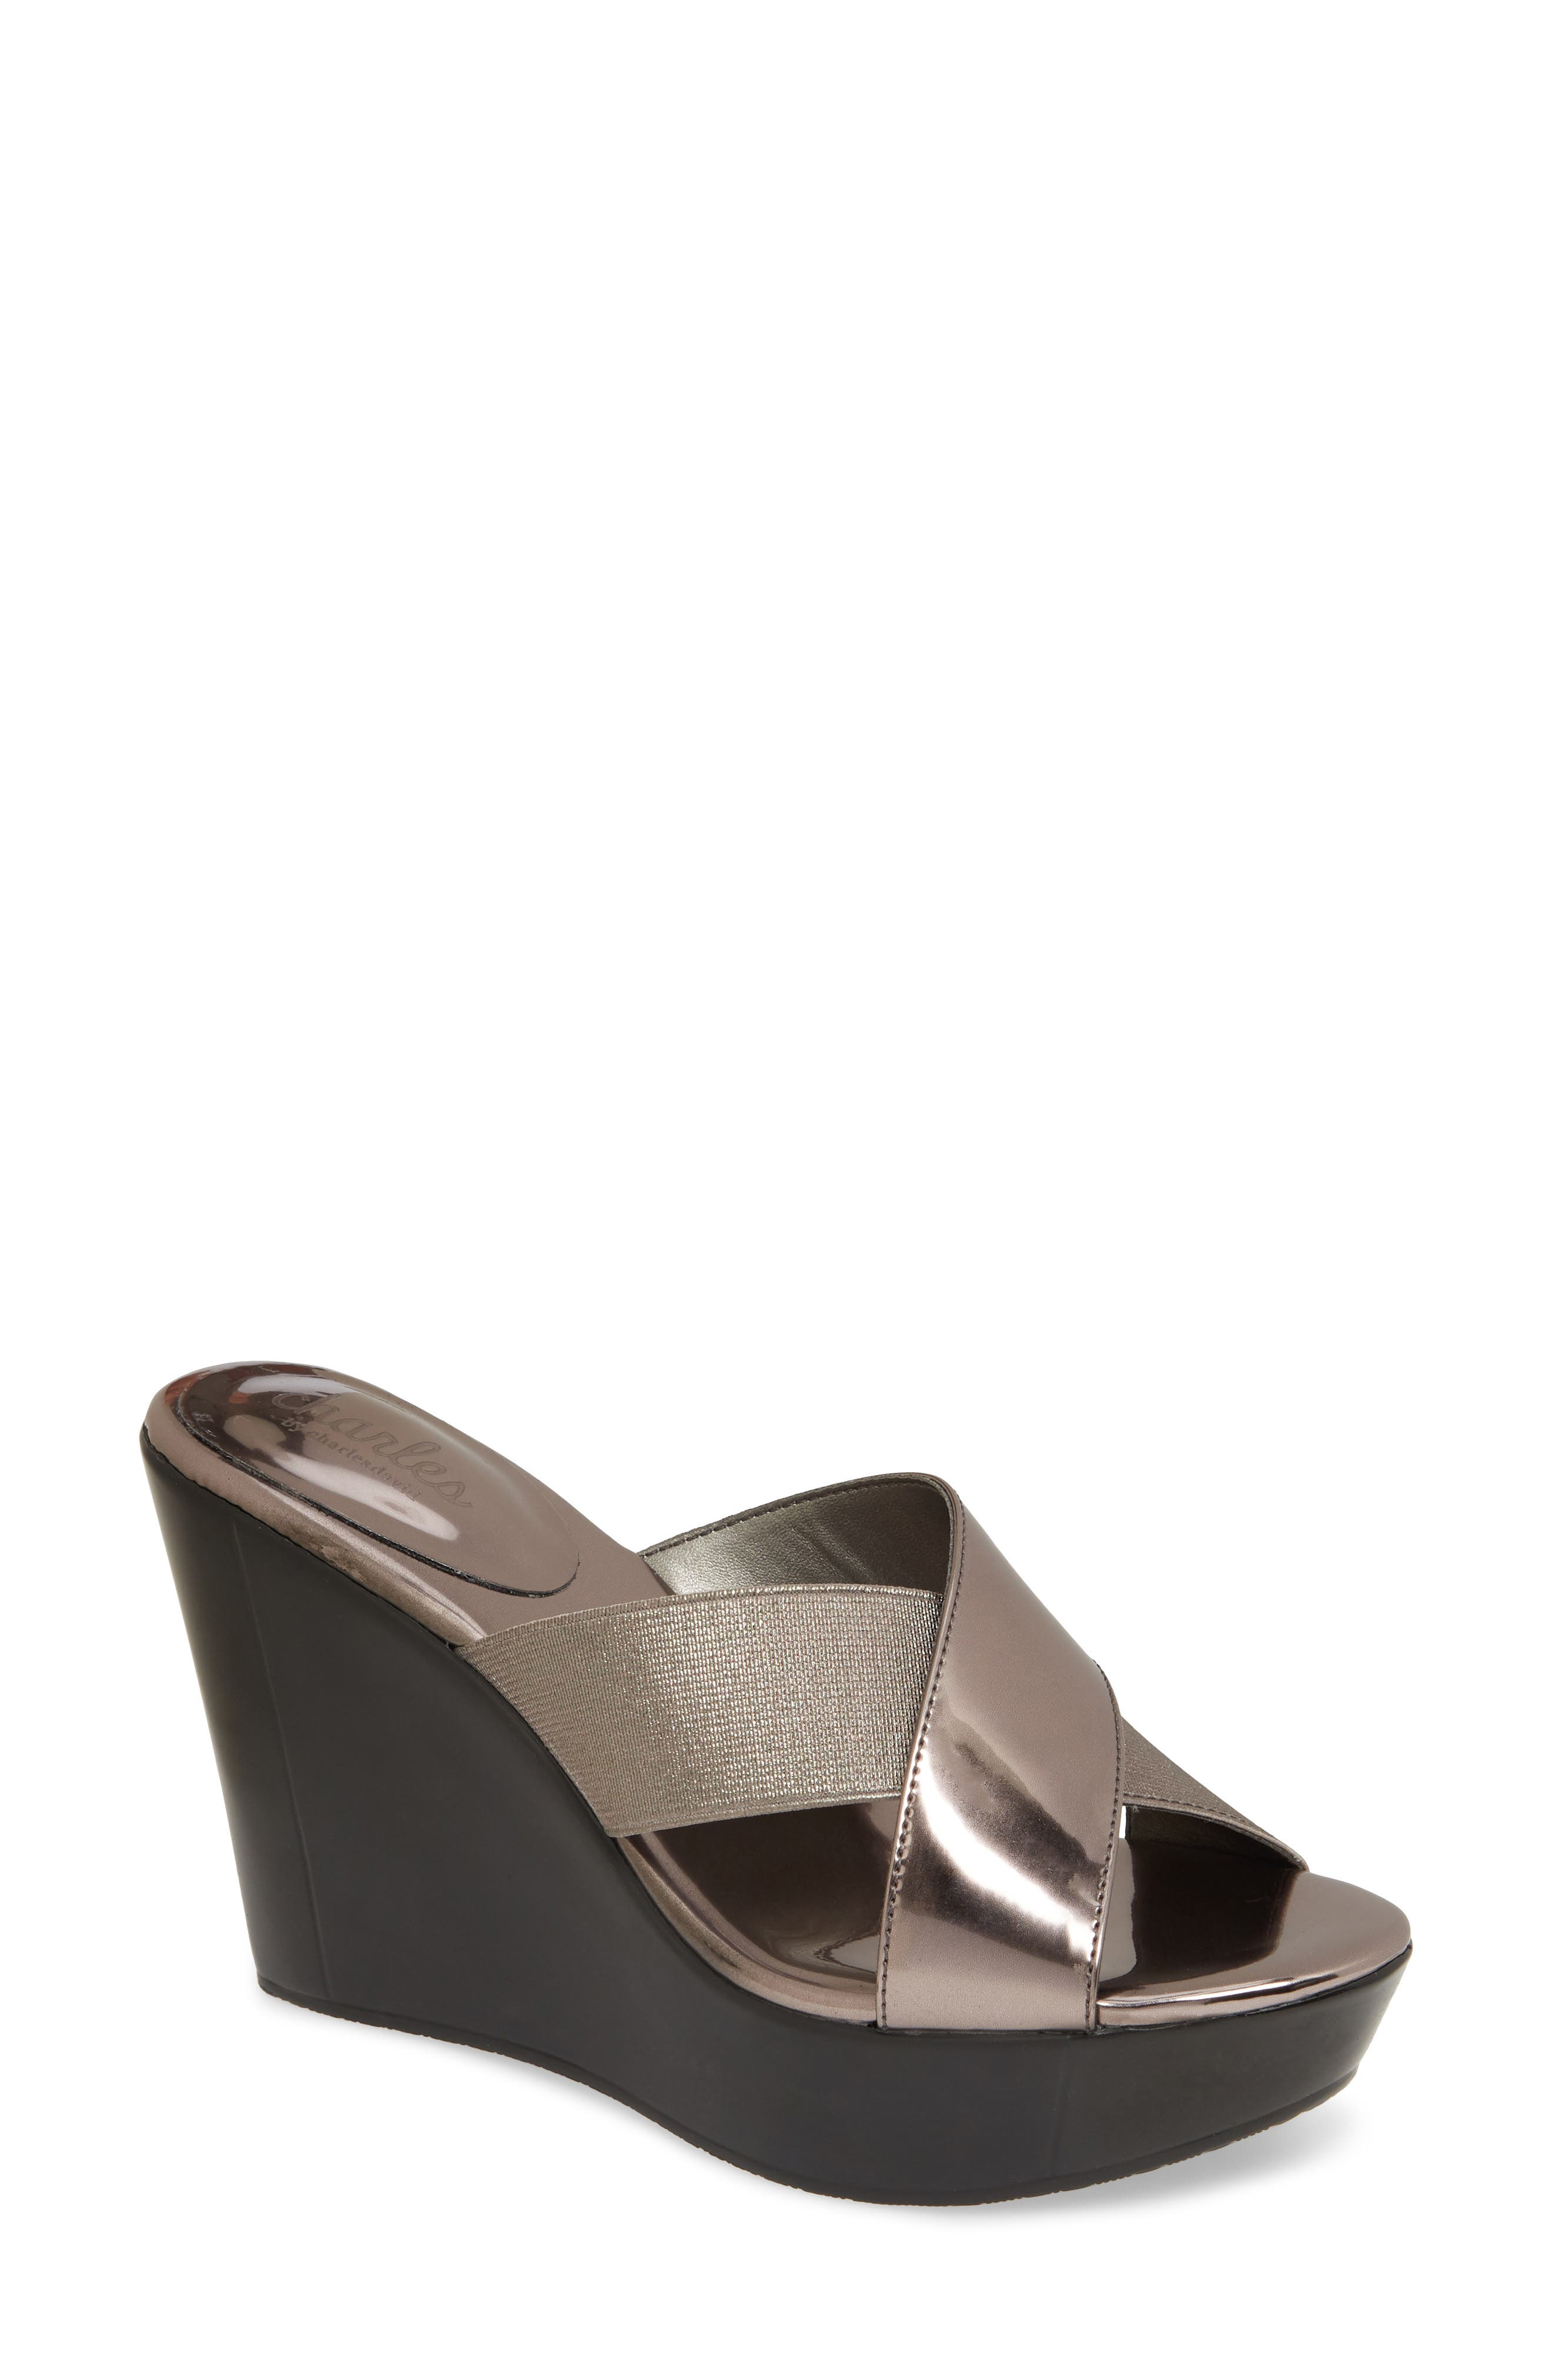 Charles By Charles David Fuzho Platform Wedge Sandal, Beige